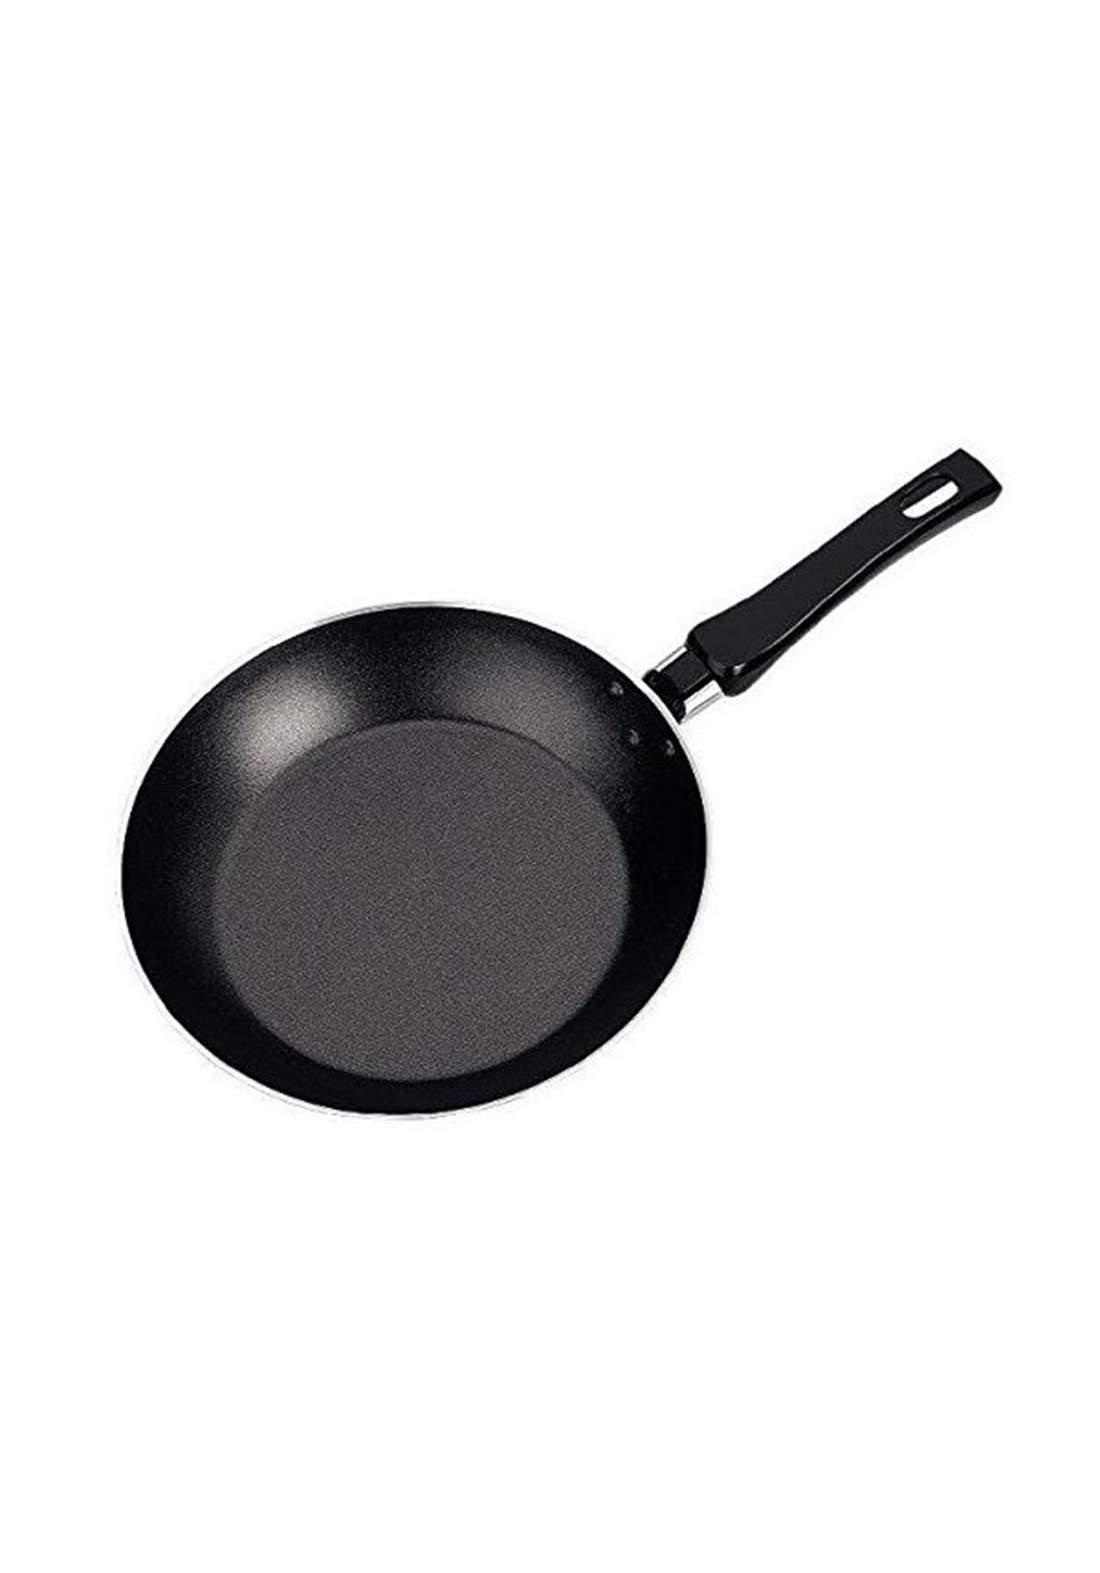 Tramontina '20180-026 Frying Pan 26 cm Black مقلاة